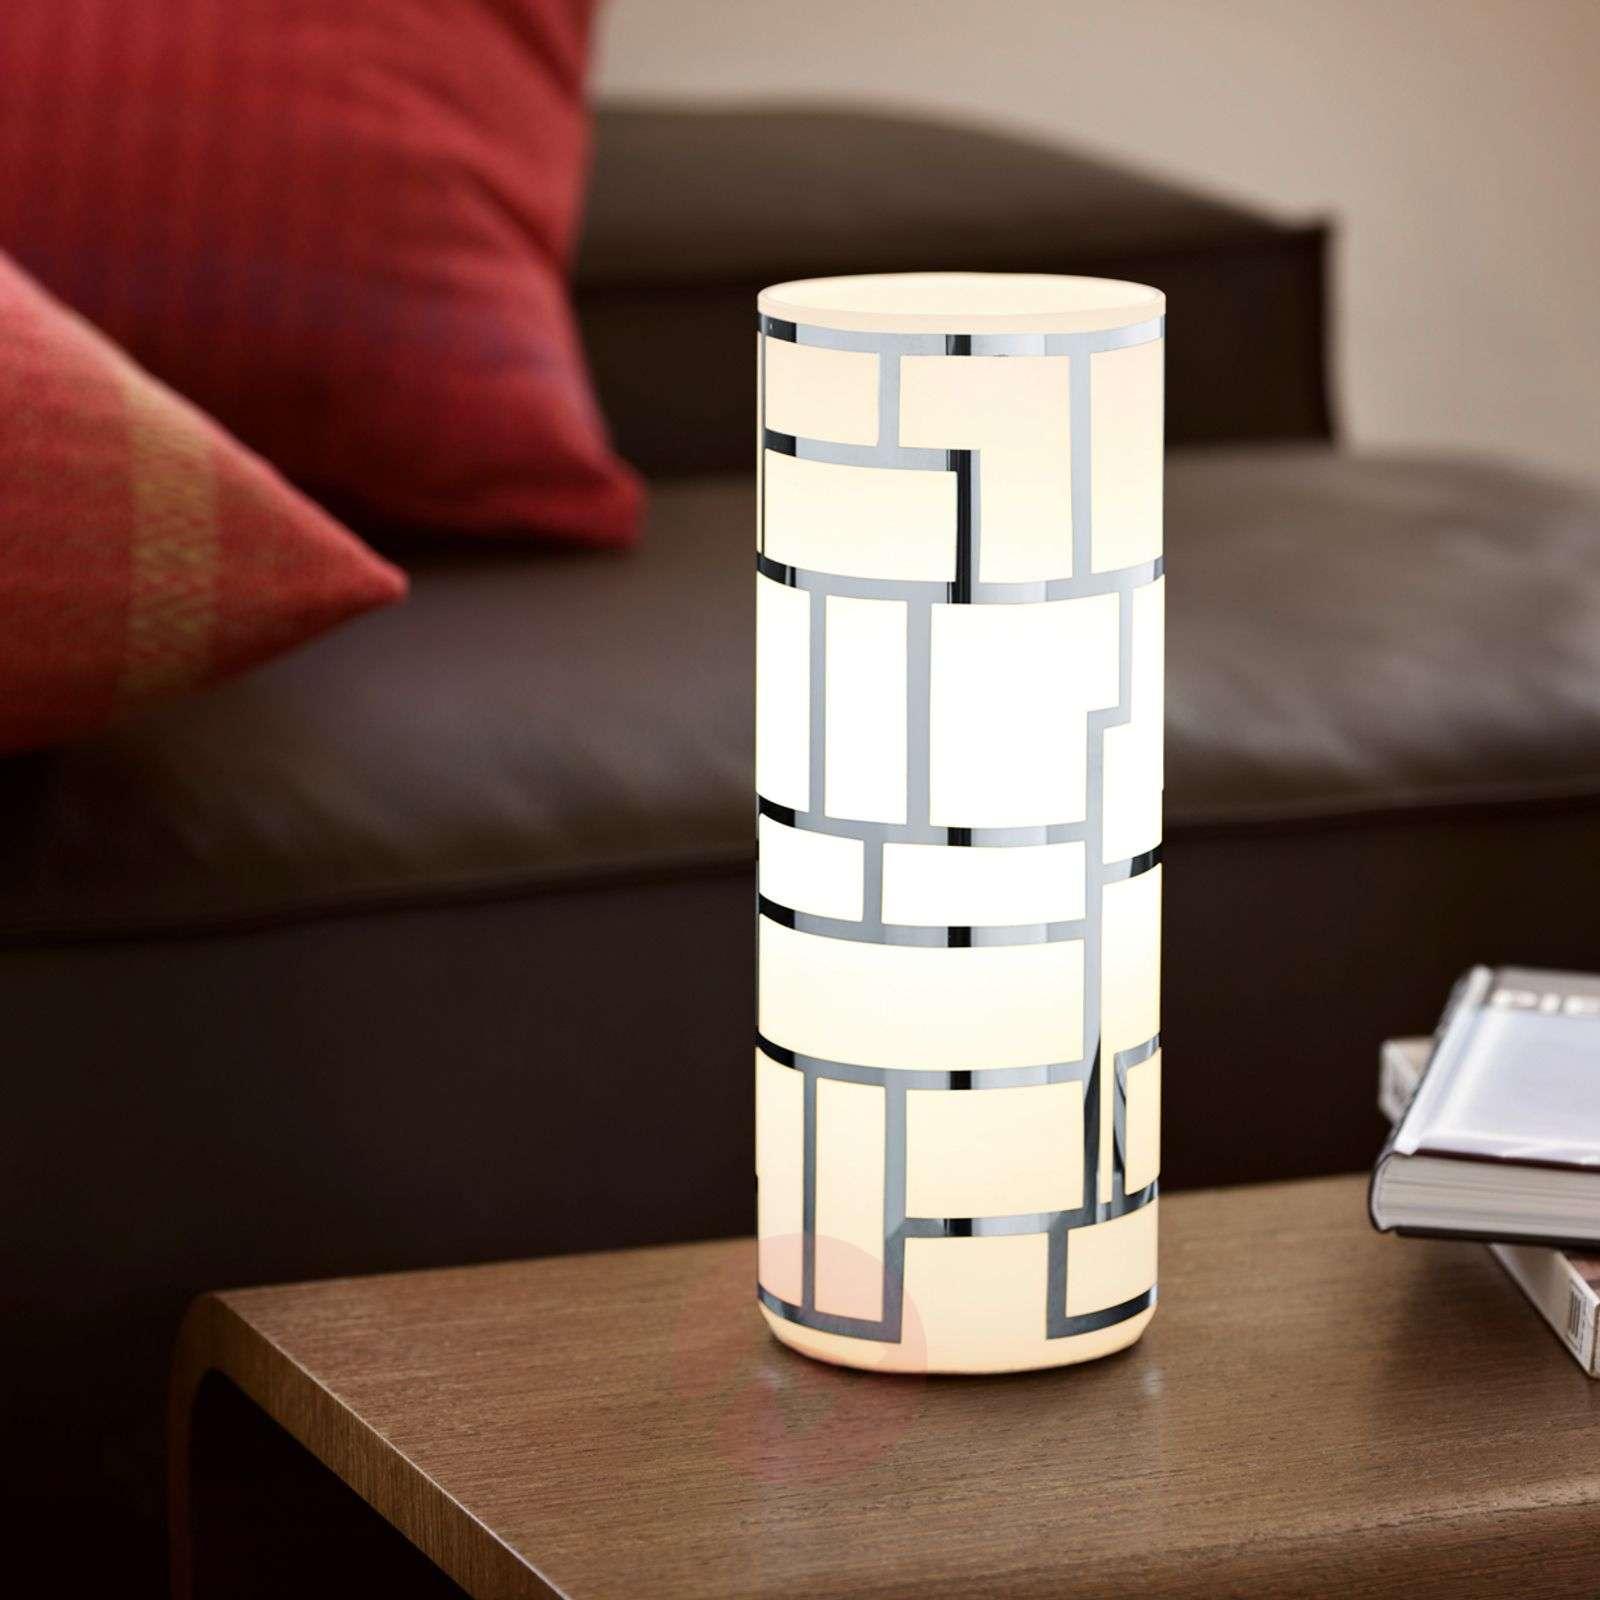 Cylindrical Bayman table lamp-3031649-01